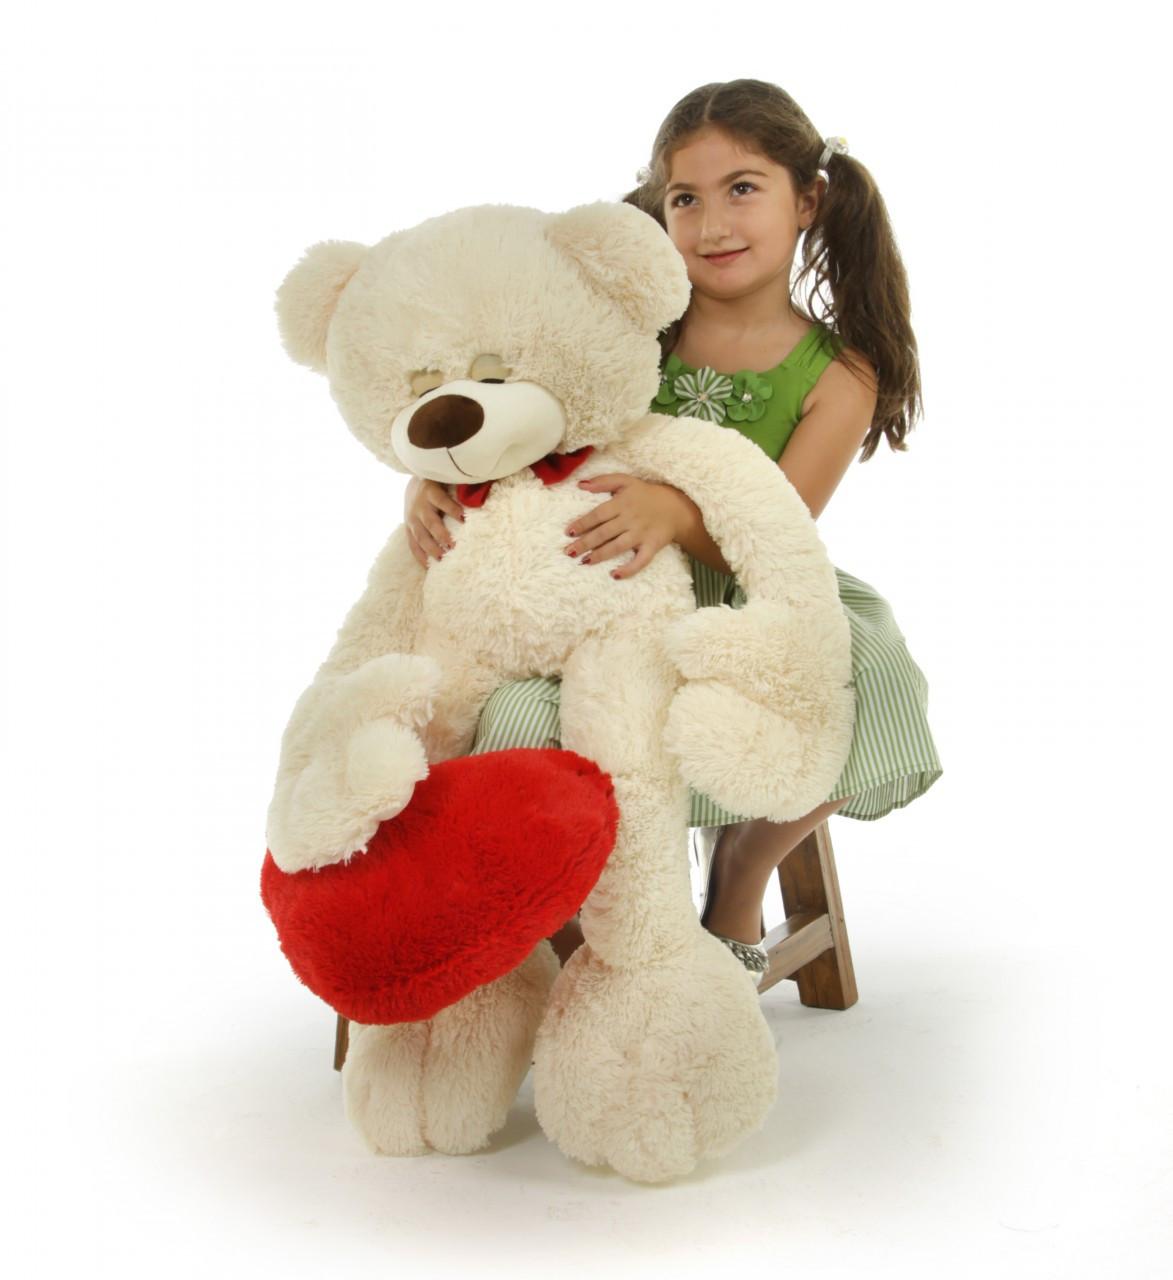 Super Cute Cream Teddy Bear with Red Heart